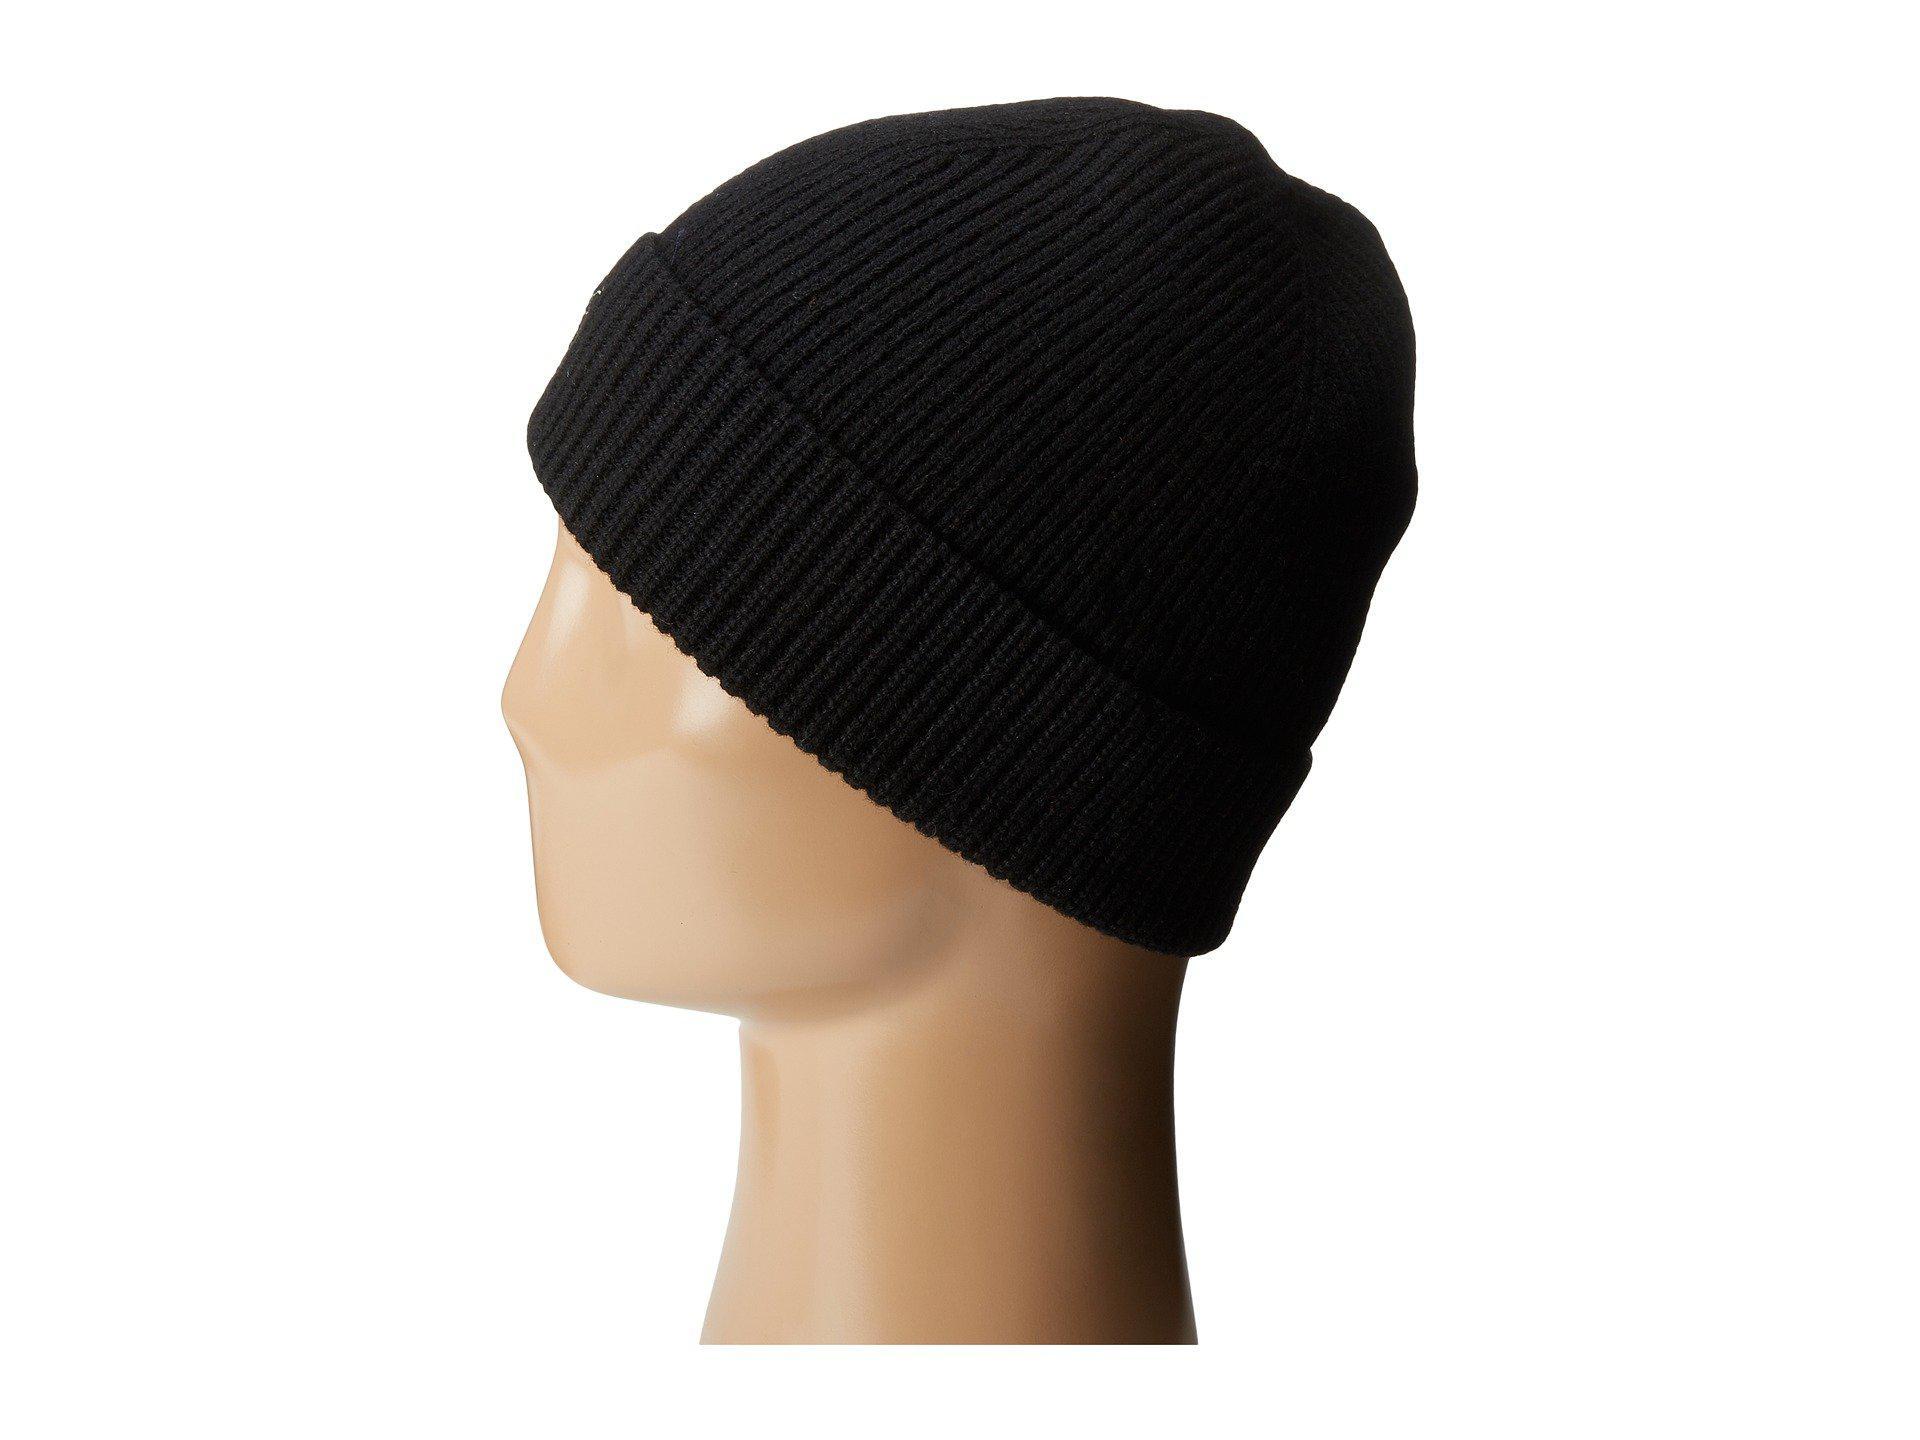 Lyst - Polo Ralph Lauren Signature Merino Cuff Hat (dark Loden) Caps ... 26e652af3bb4